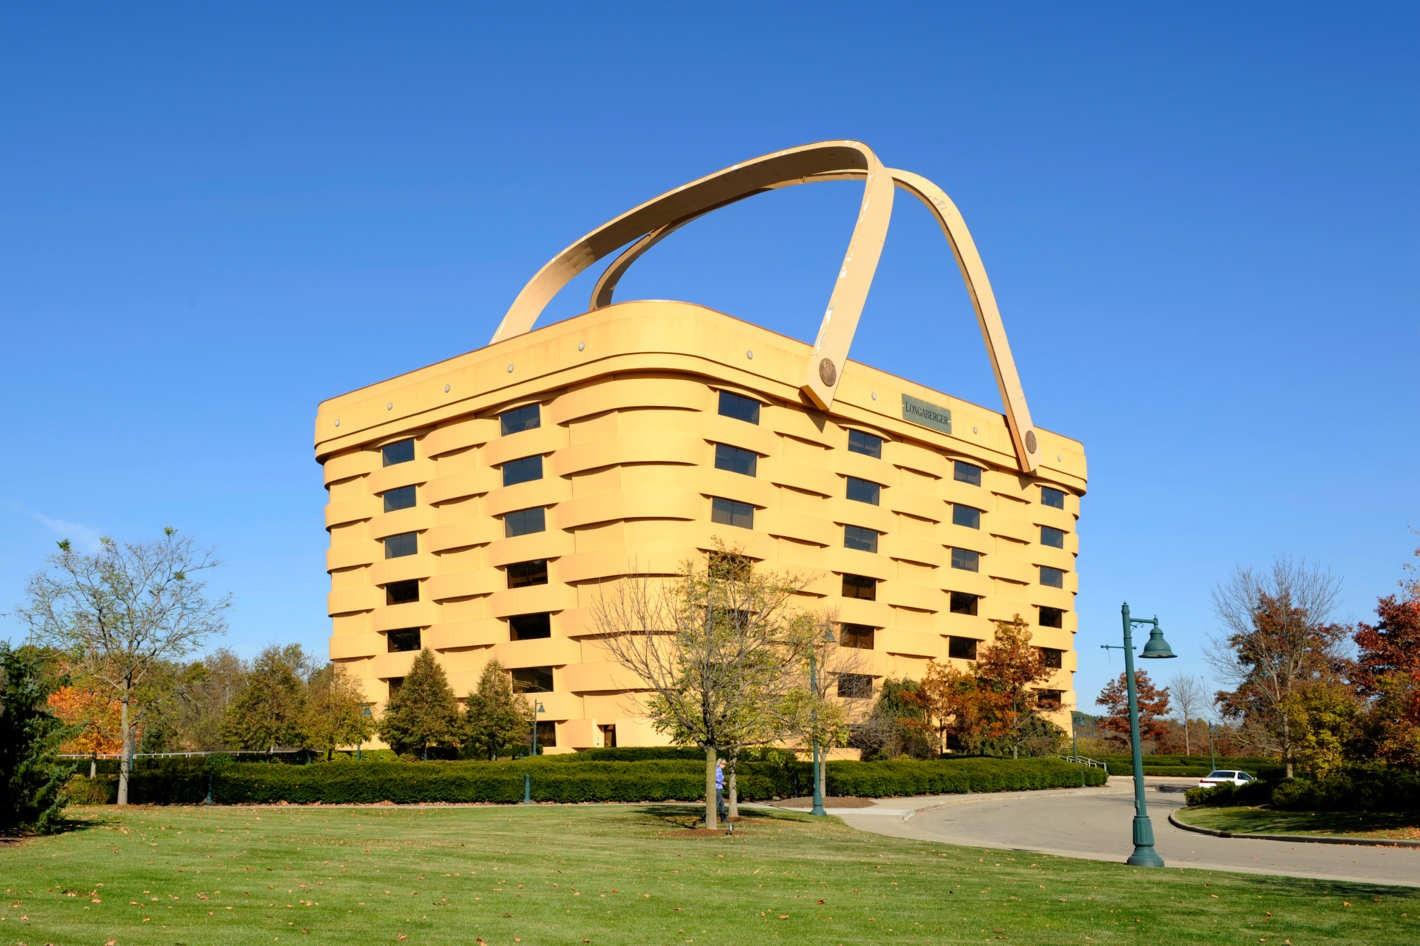 08-longaberger-basket-building.w710.h473.2x.jpg